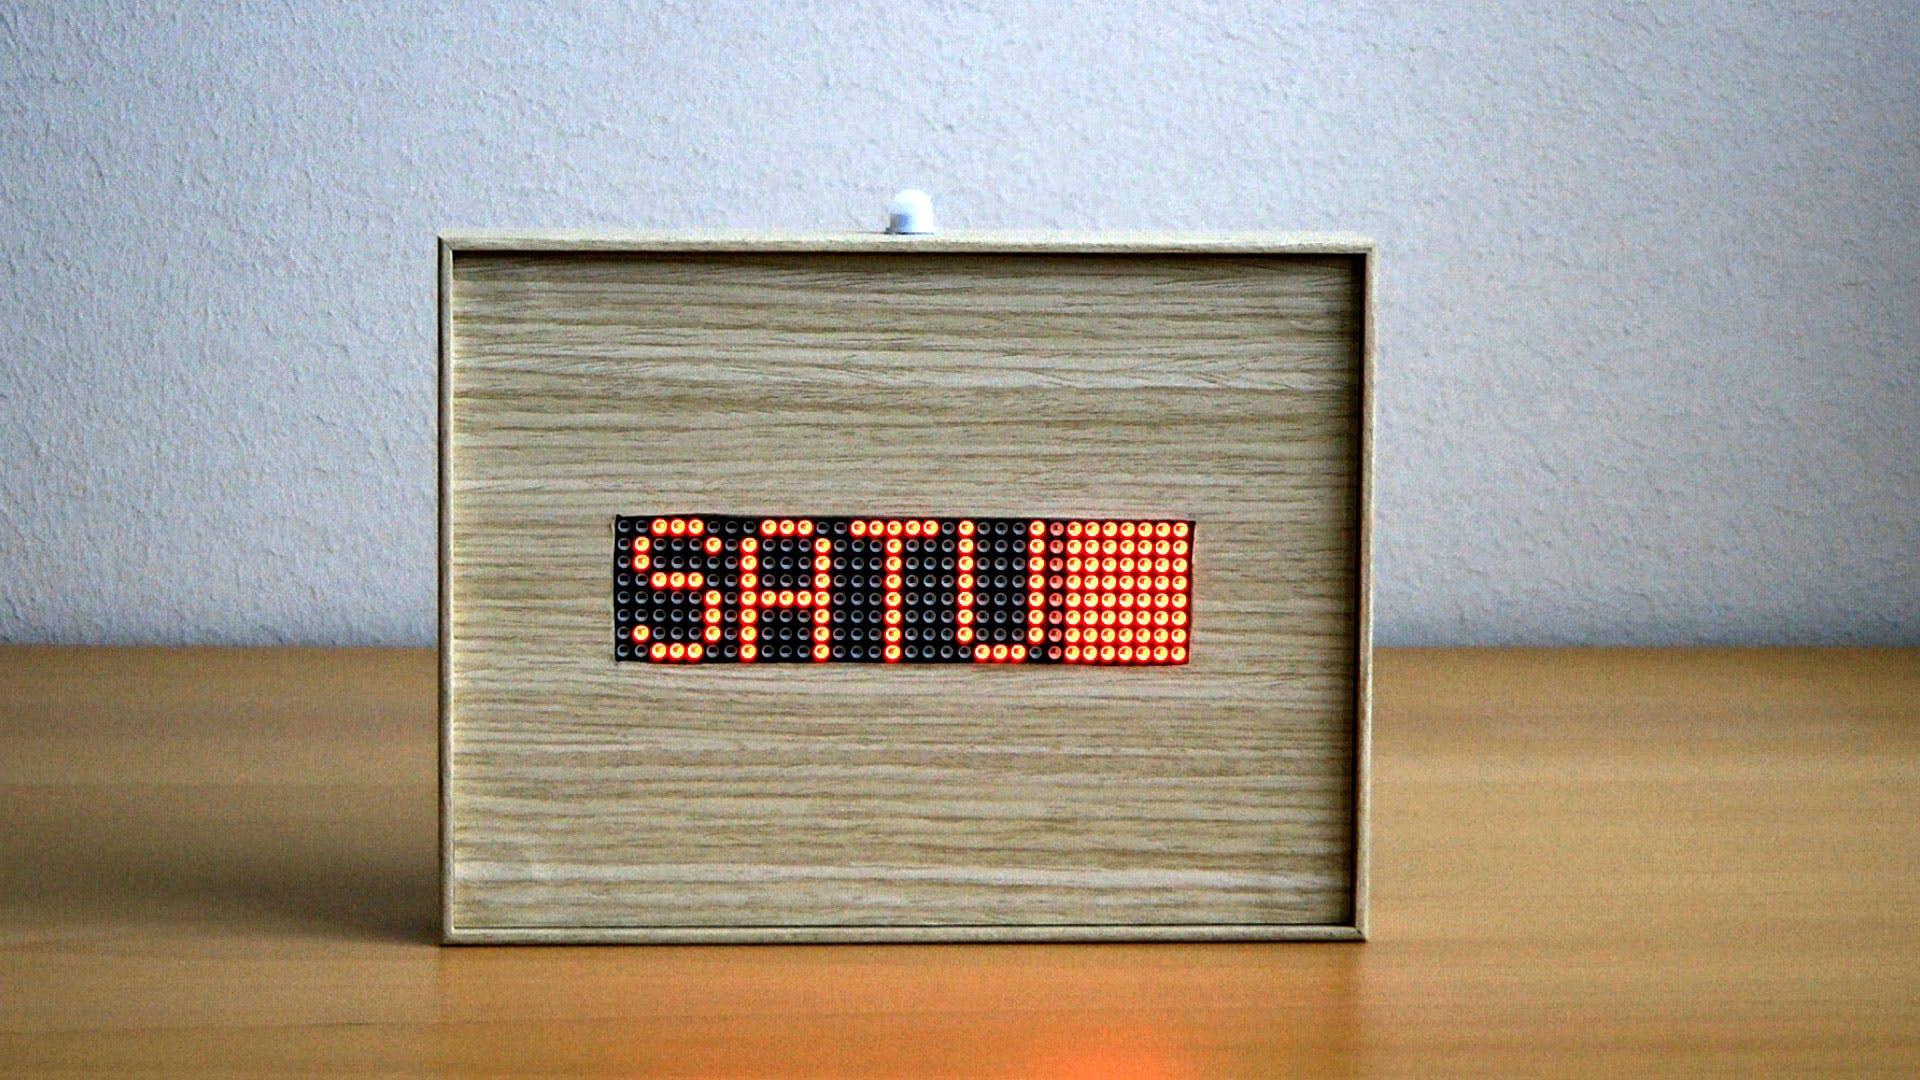 Arduino 32x8 LED Matrix Info Display